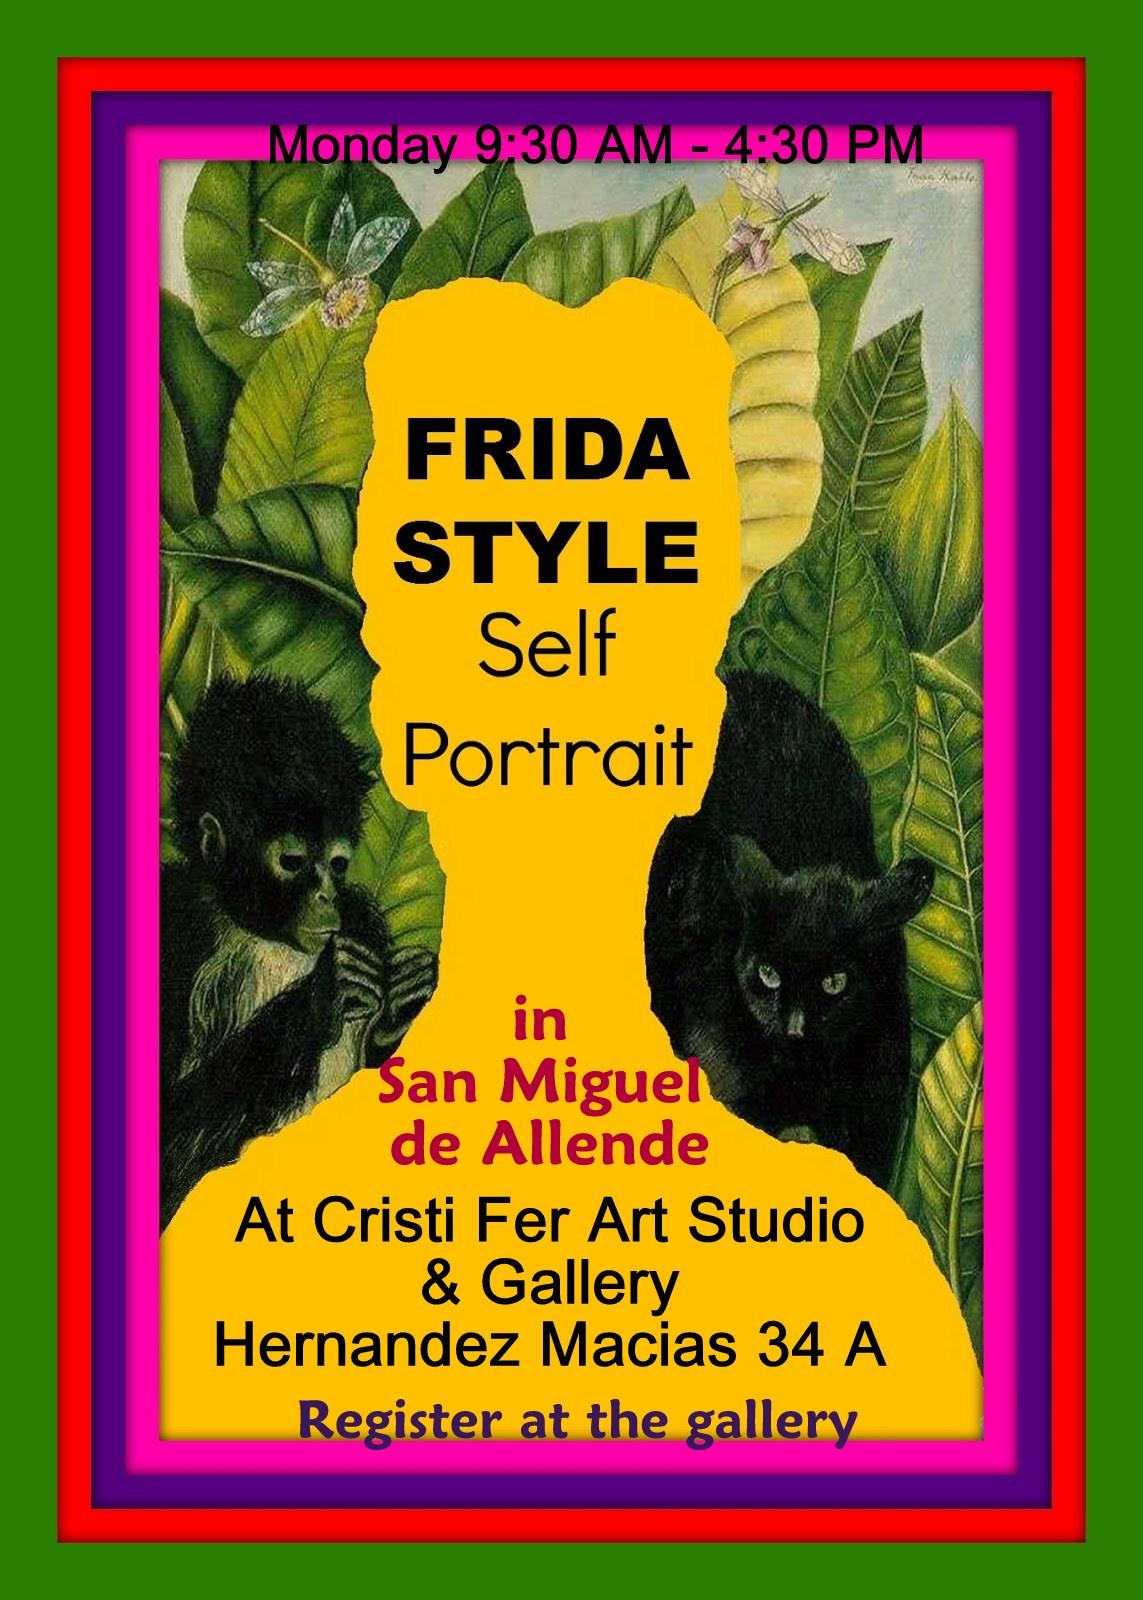 Frida Style Self Portrait